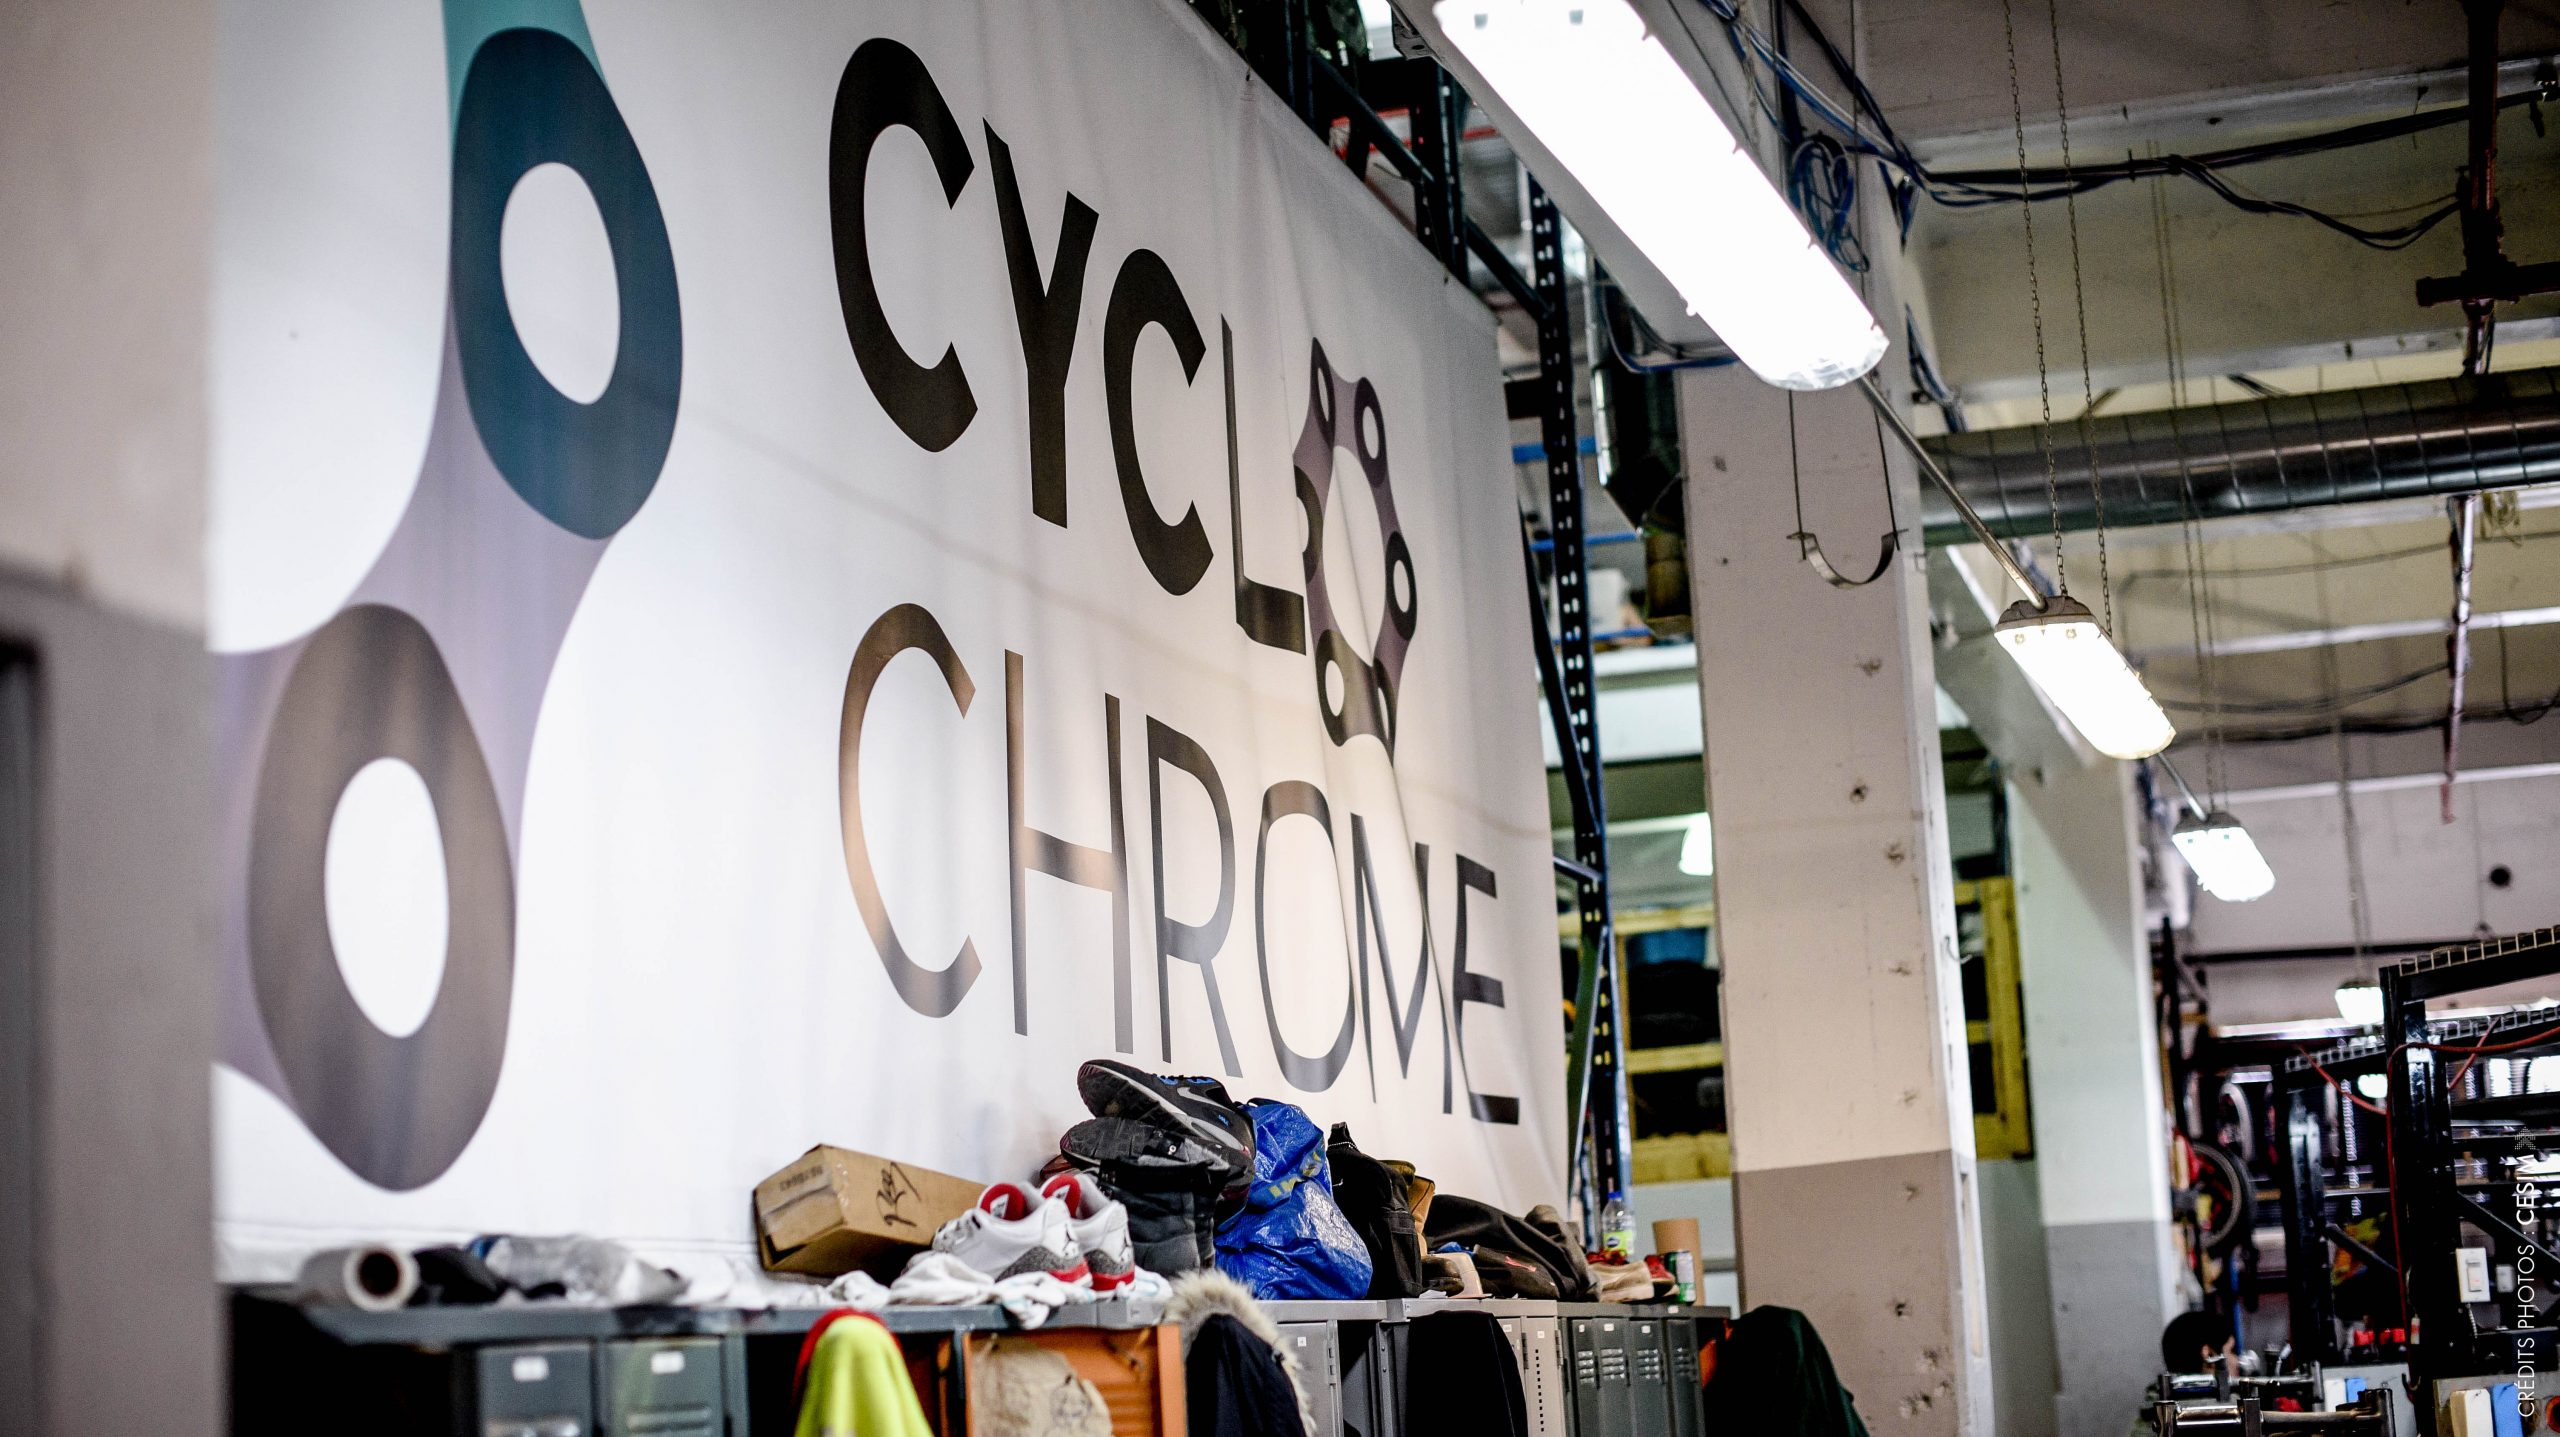 CycloChrome